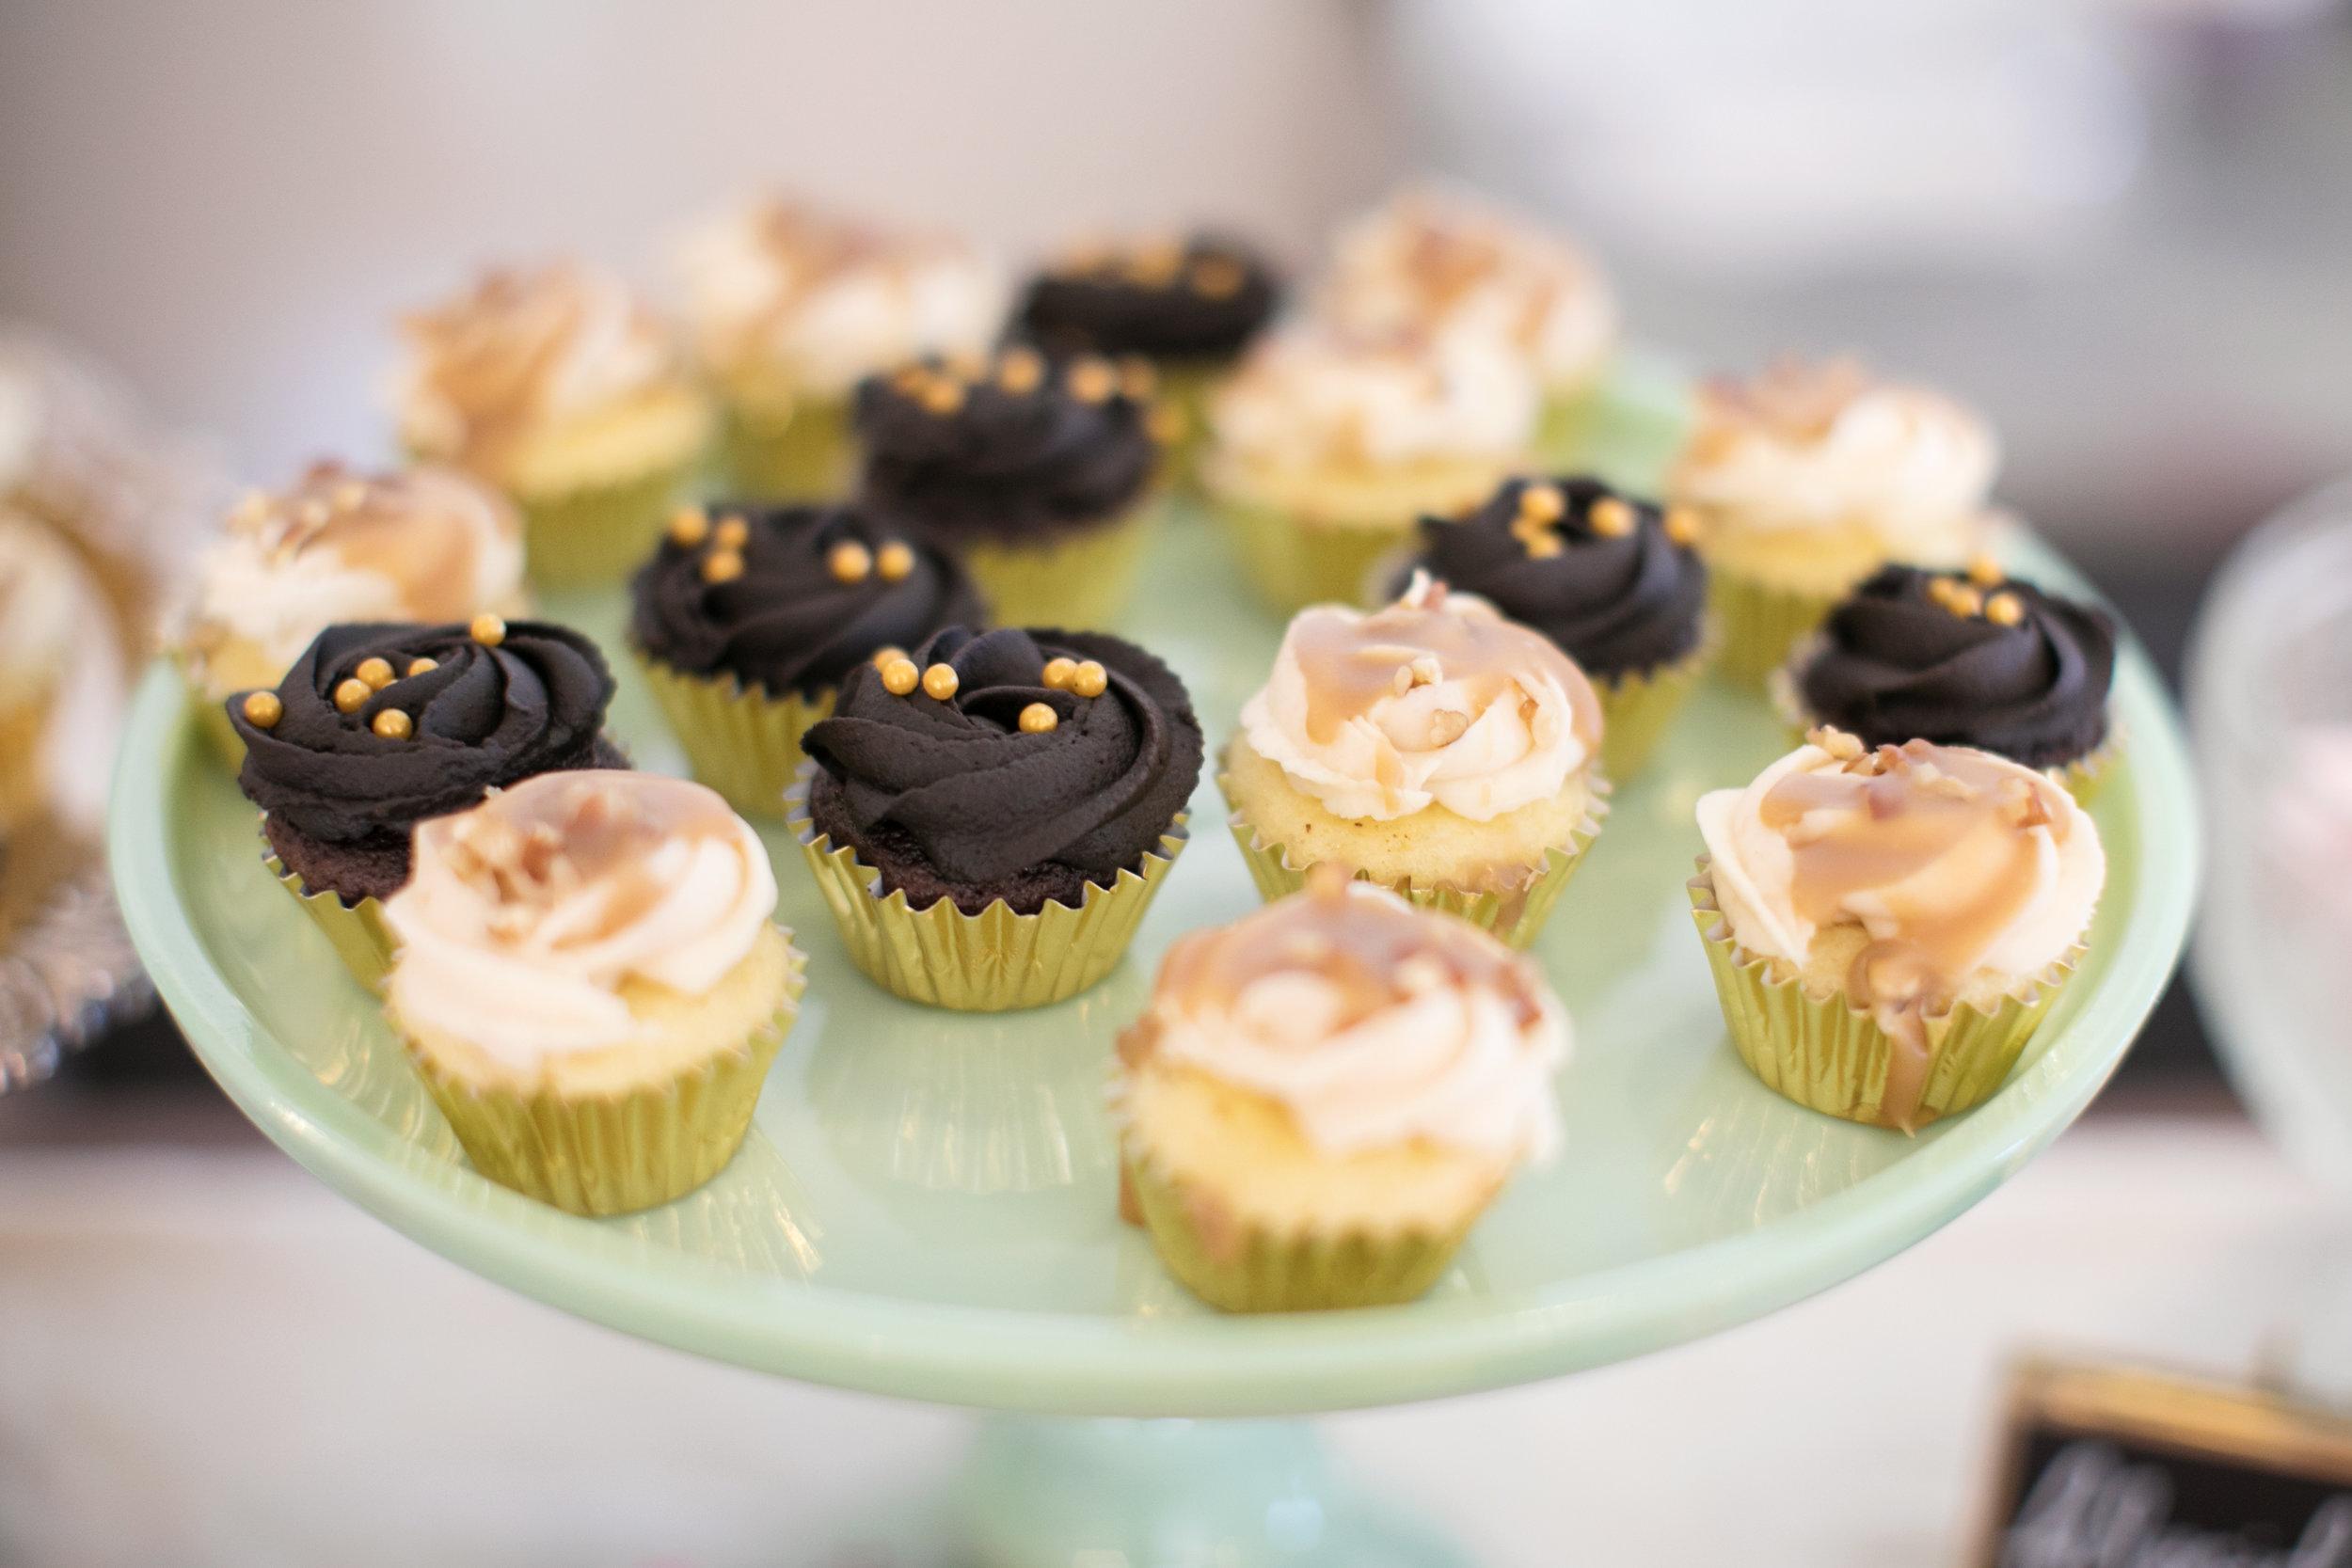 Bakehouse cupcakes